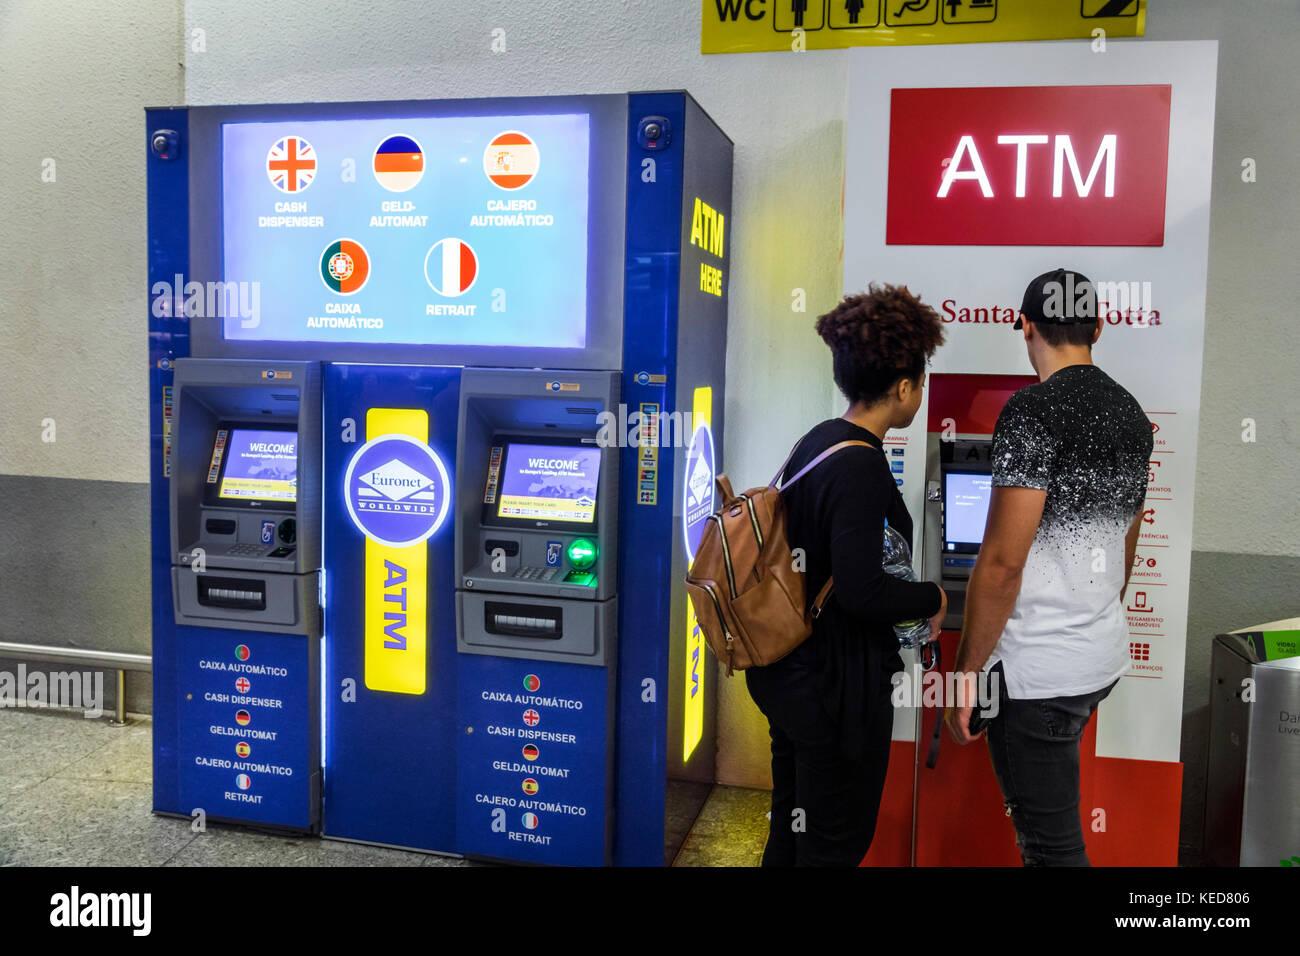 Lissabon Portugal Humberto Delgado Flughafen LIS Portela Flughafen Terminal ATM Geldautomaten Mann Frau Paar Hispanic Stockbild